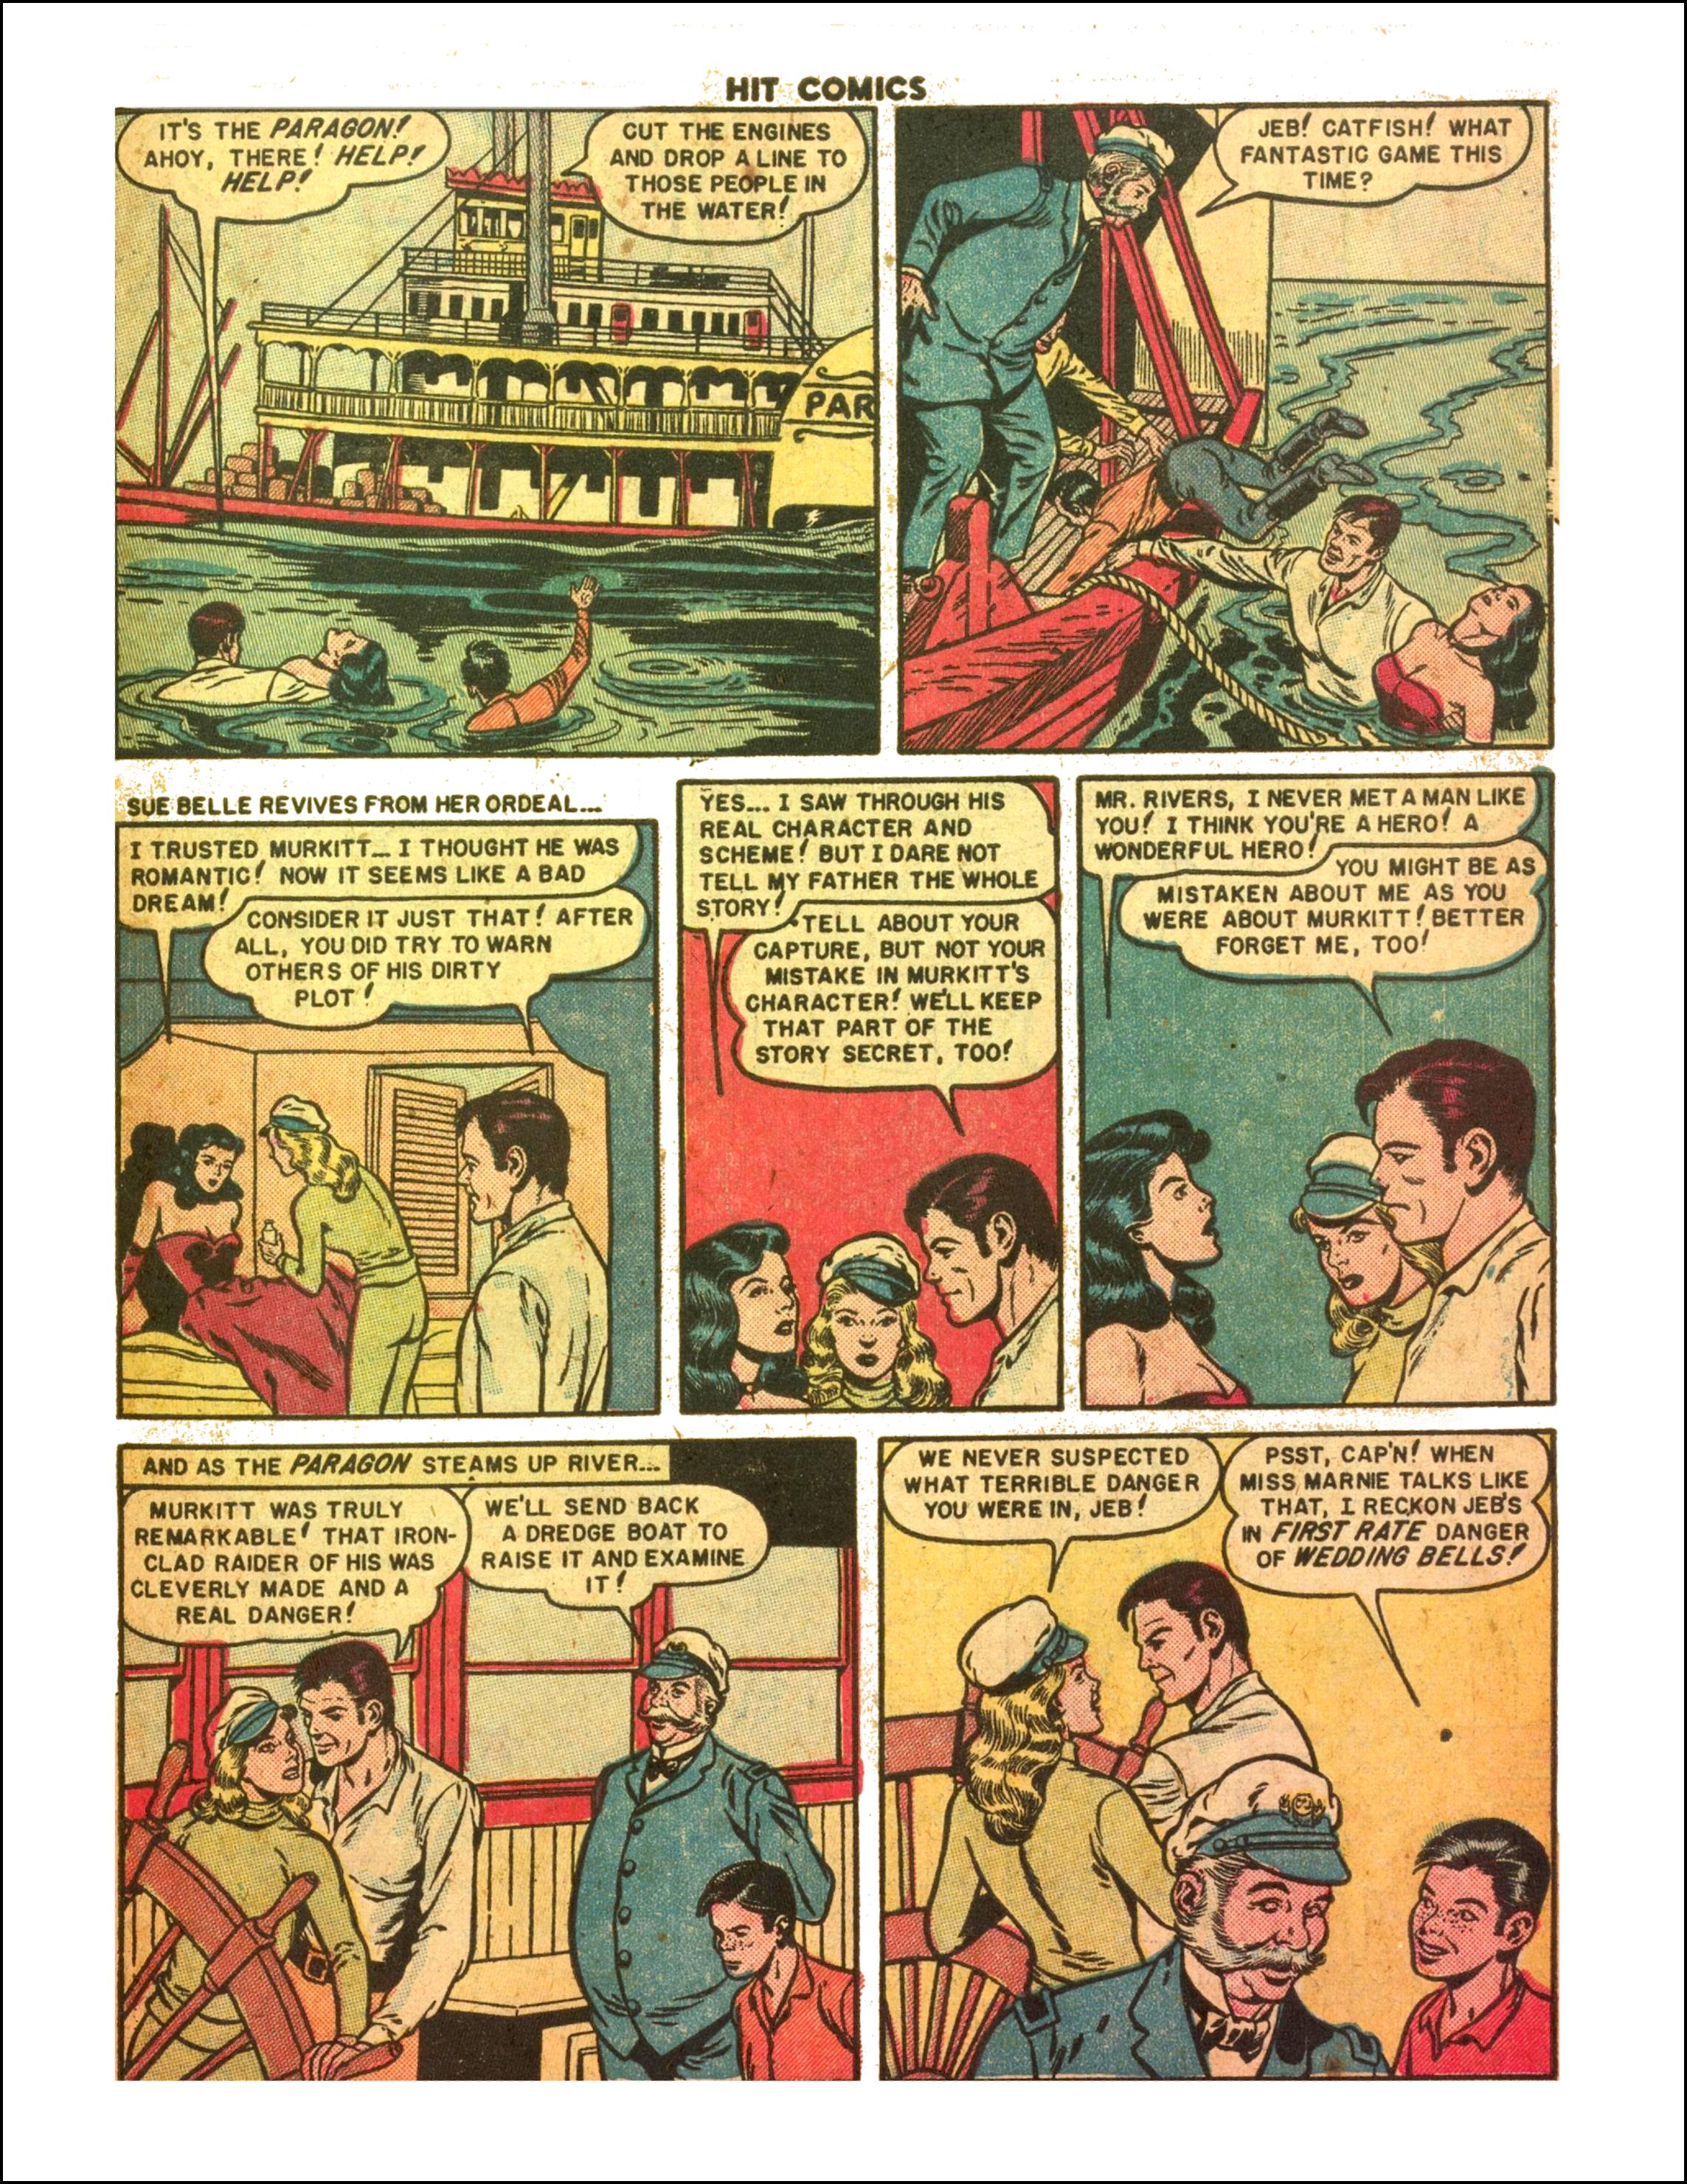 Read online Hit Comics comic -  Issue #65 - 15